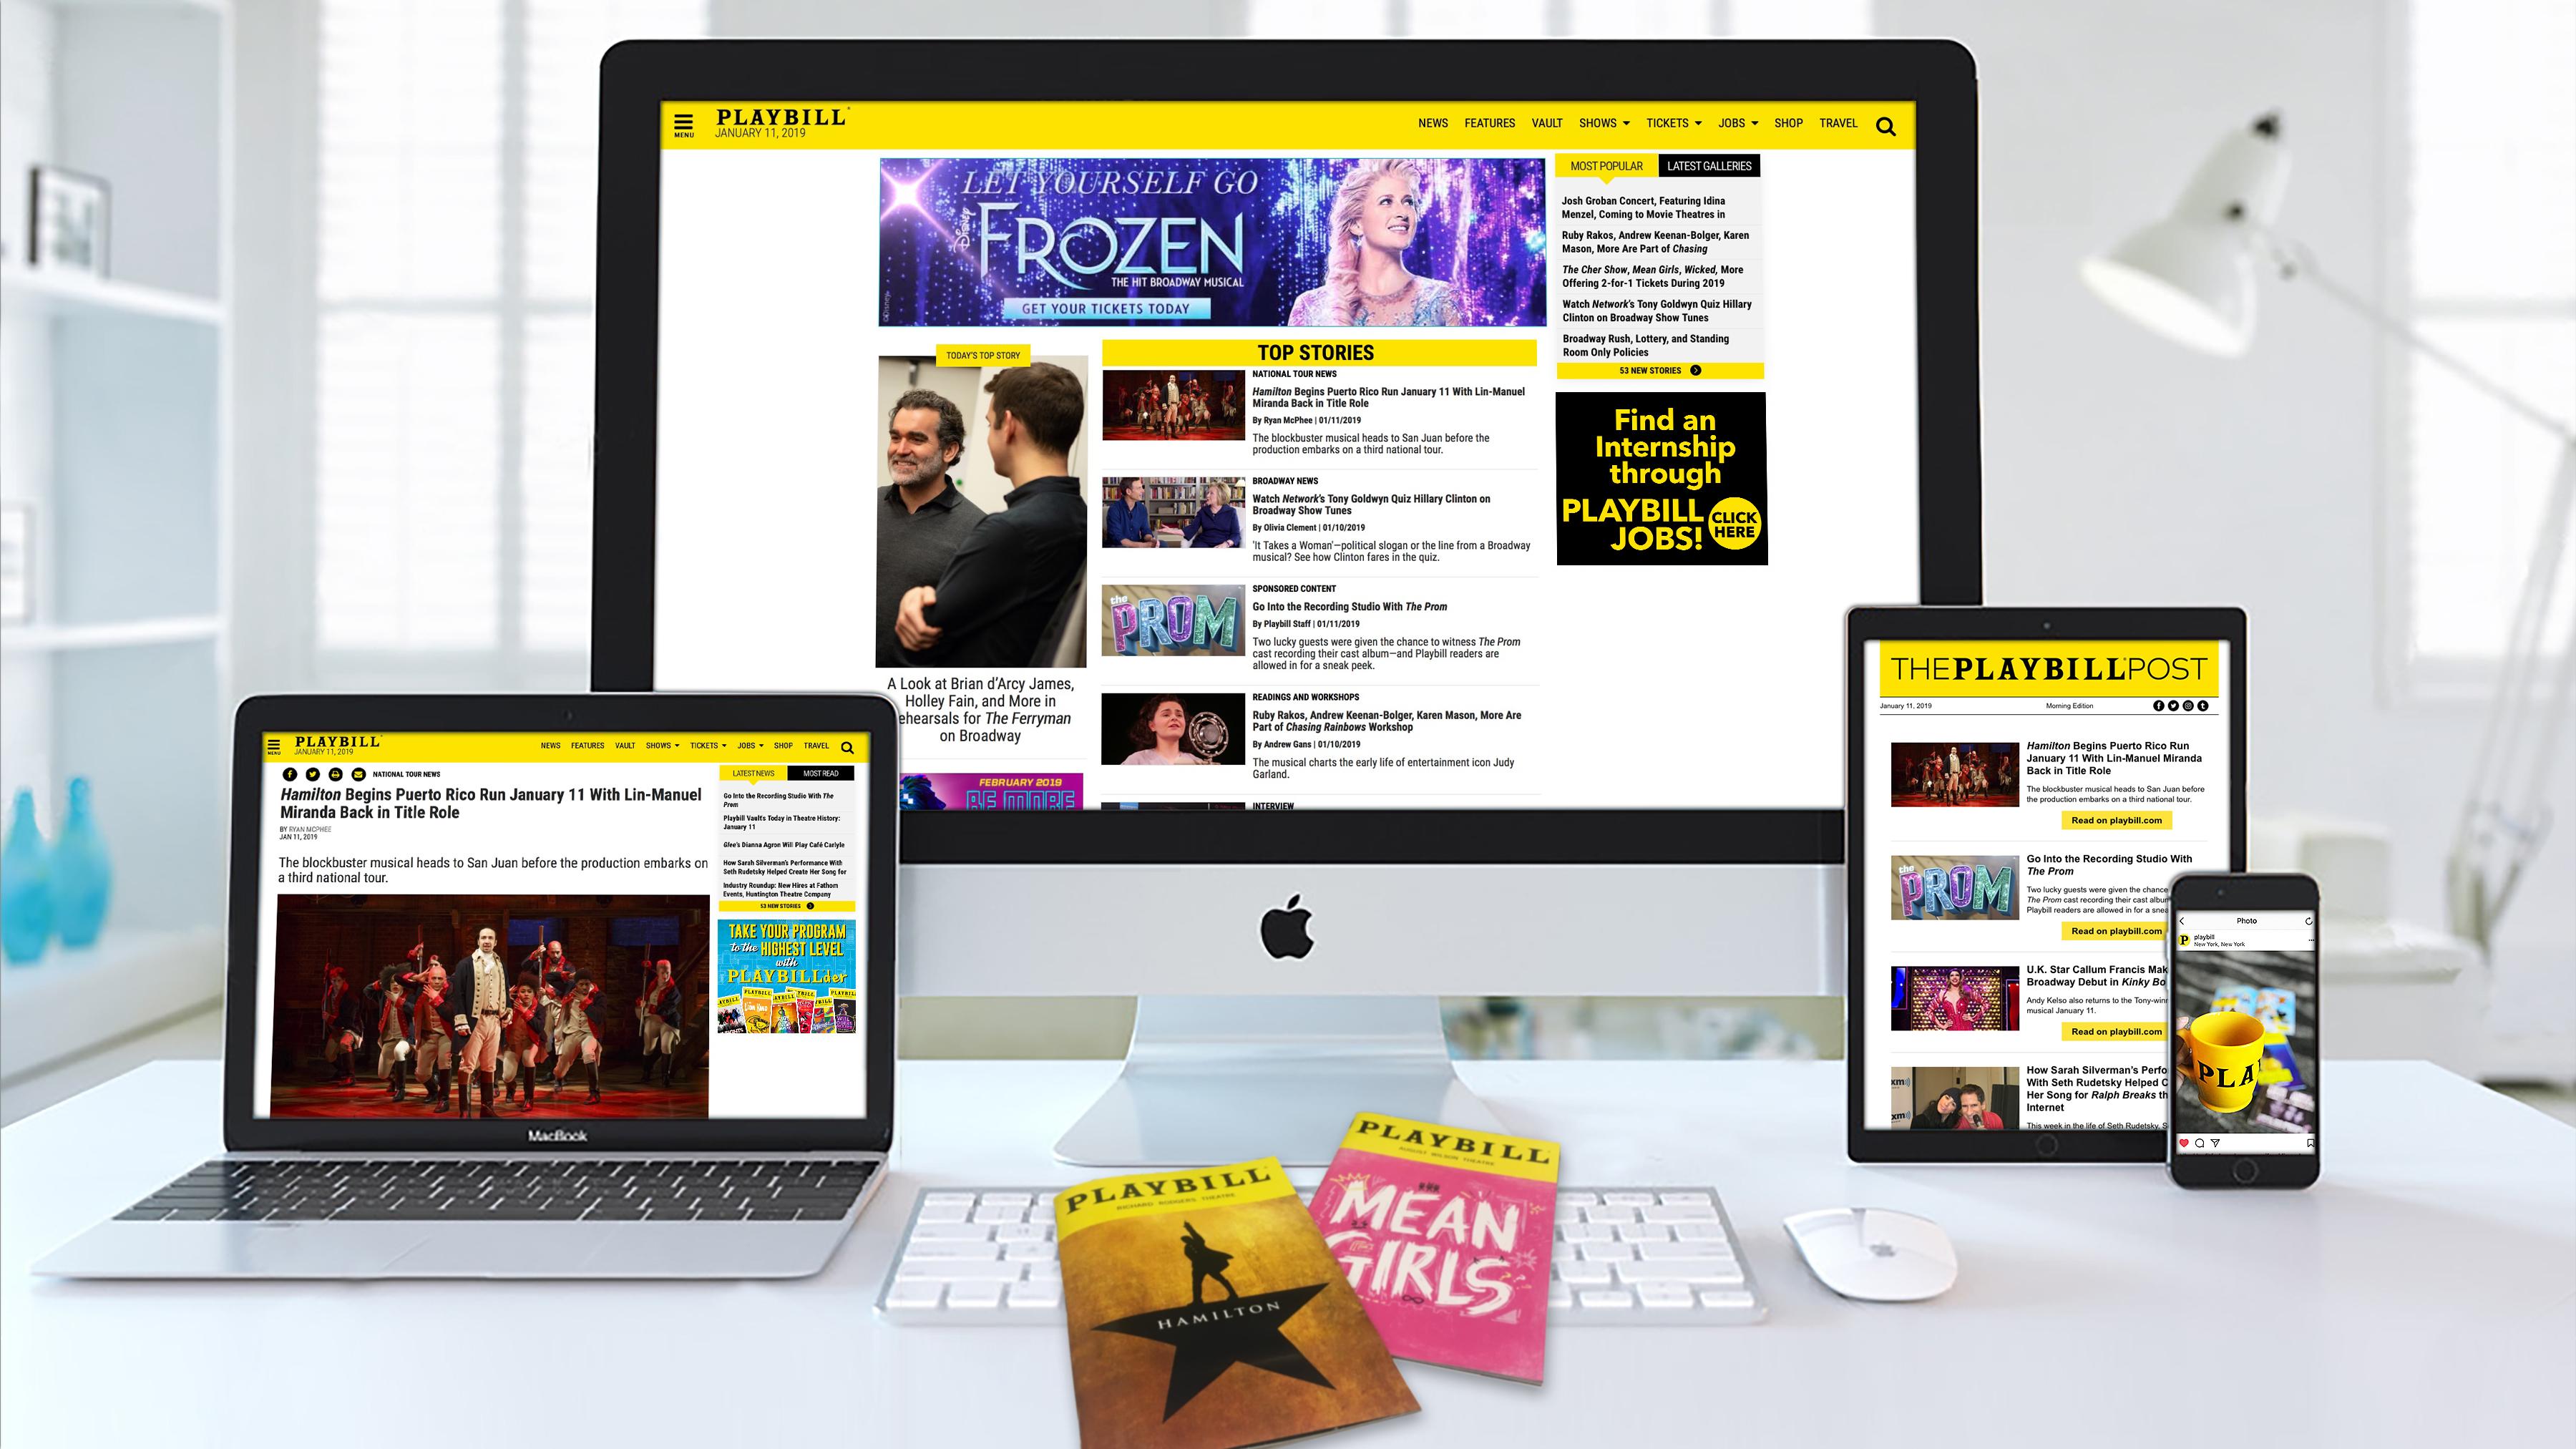 Playbill Promo Image